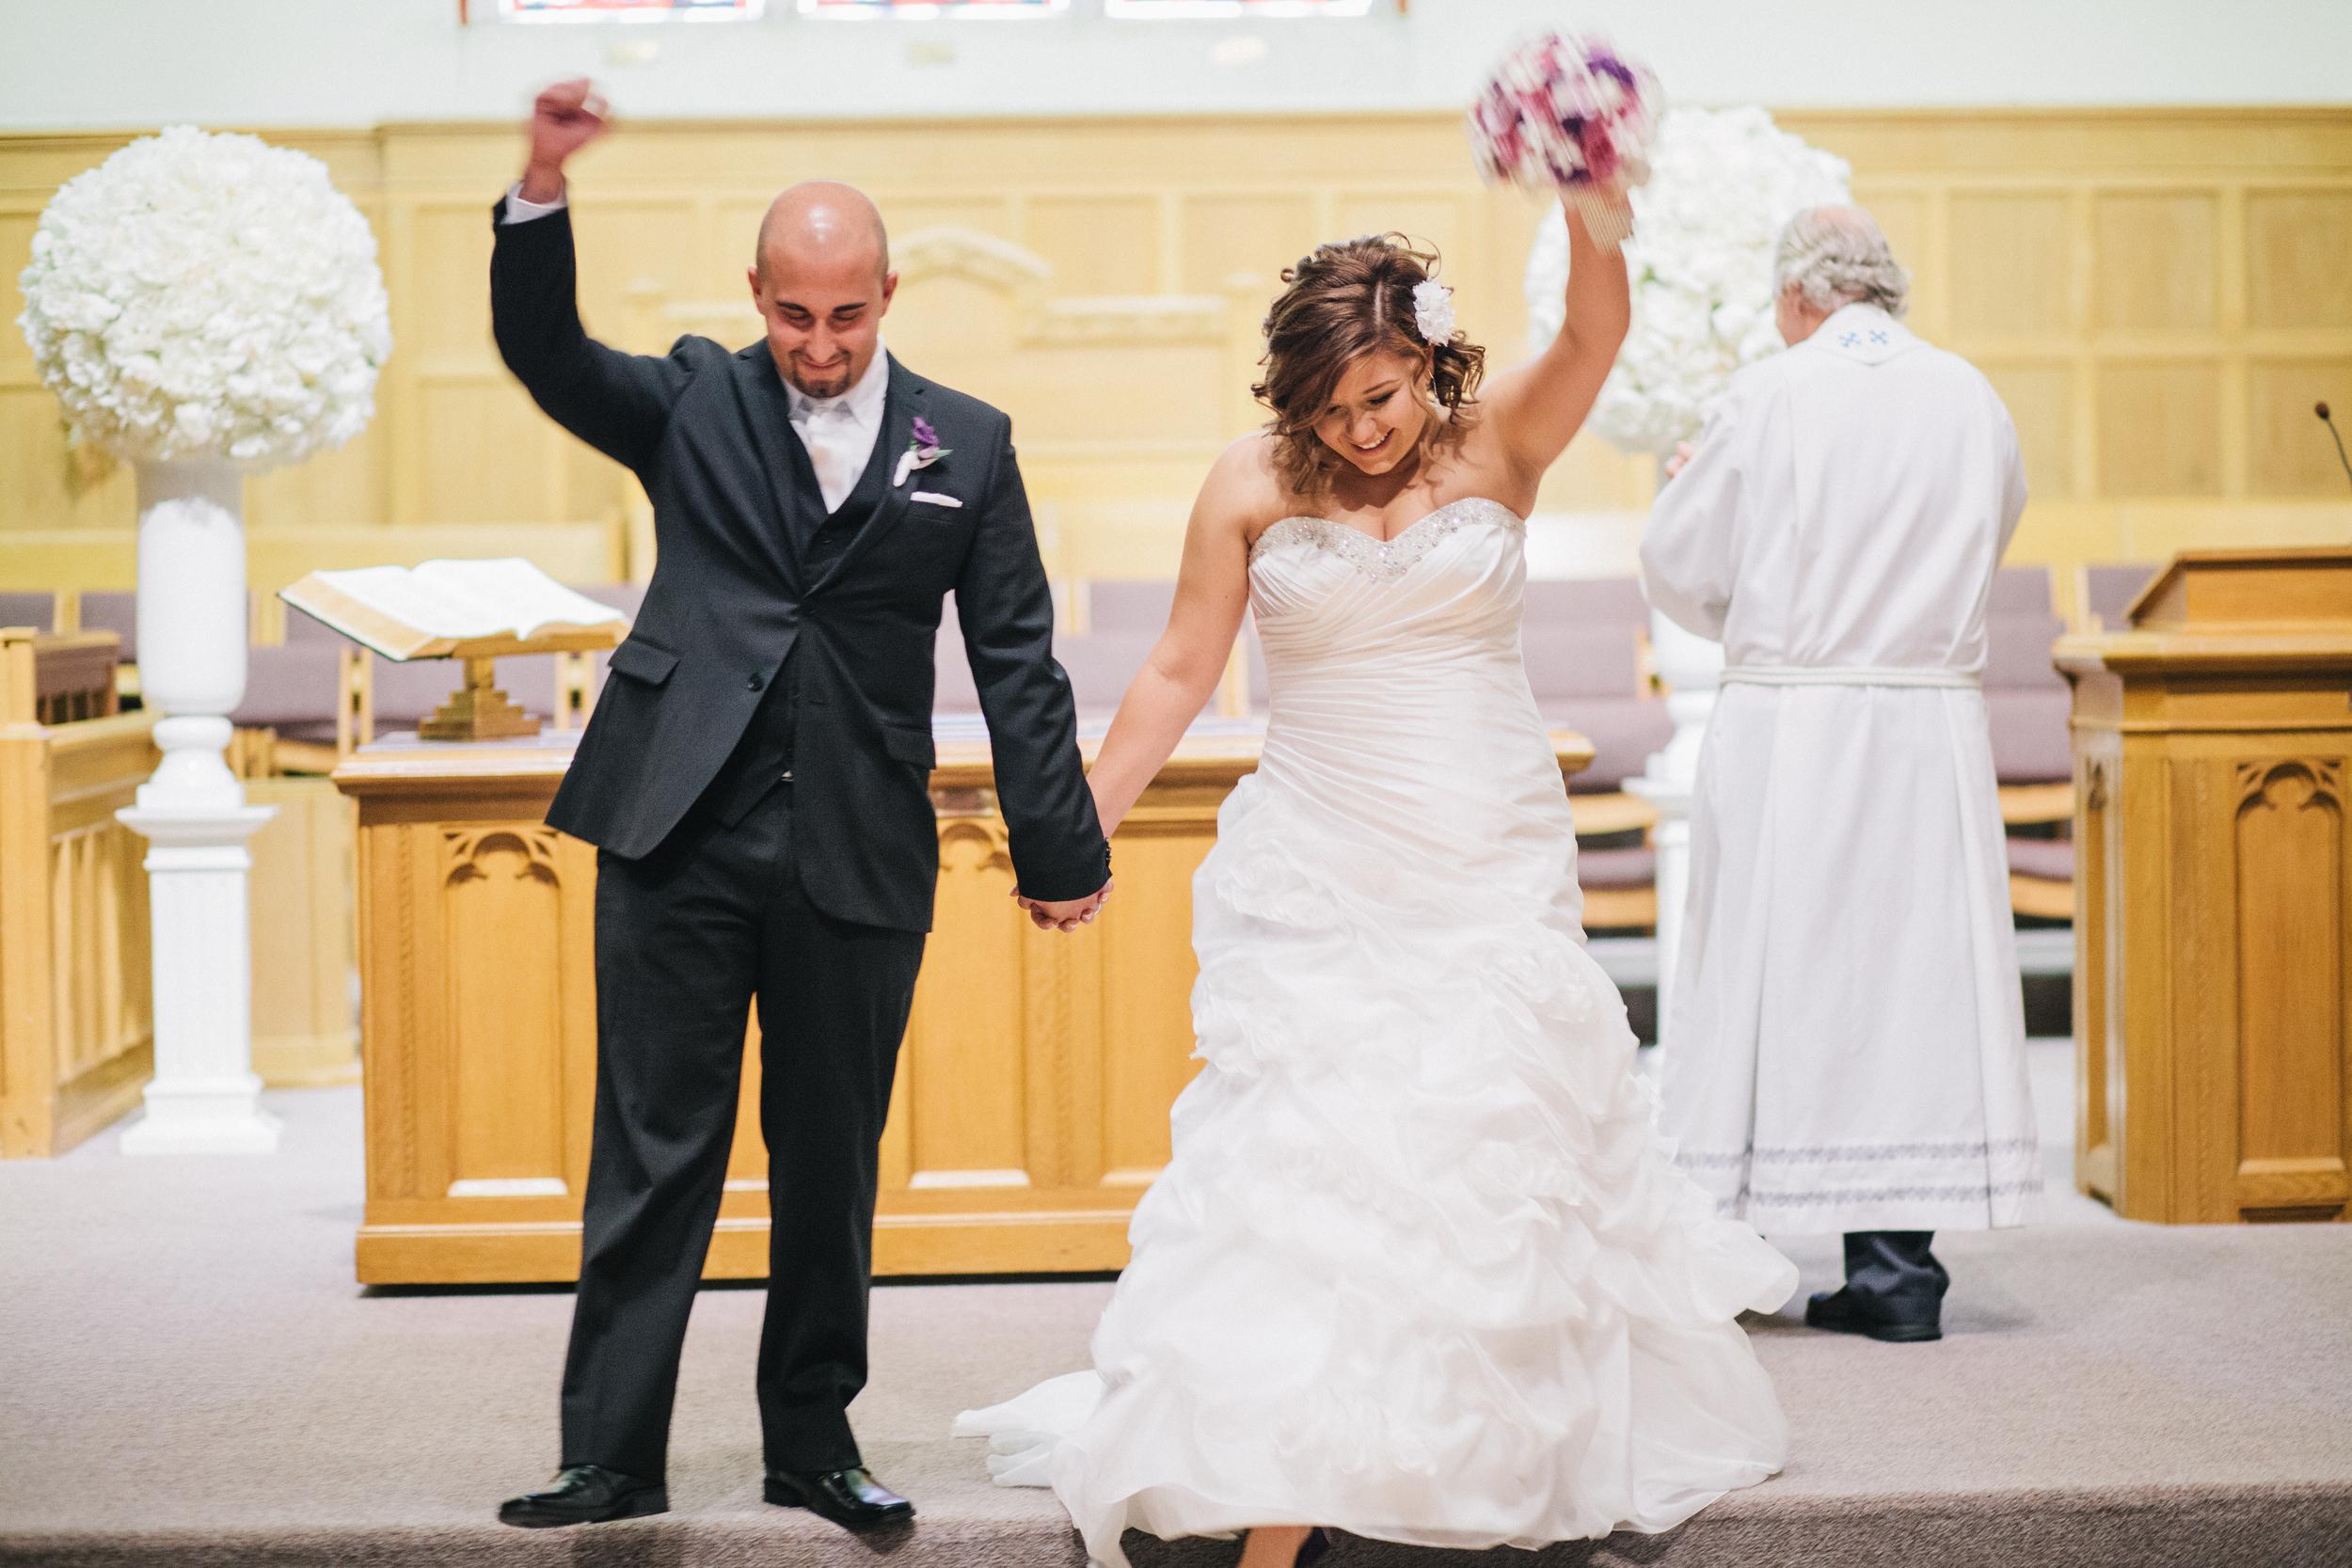 Stephanie-Kyle-paradise-banquet-hall-michael-rousseau-photography-best-toronto-wedding-photographer-documentary-wedding027.JPG